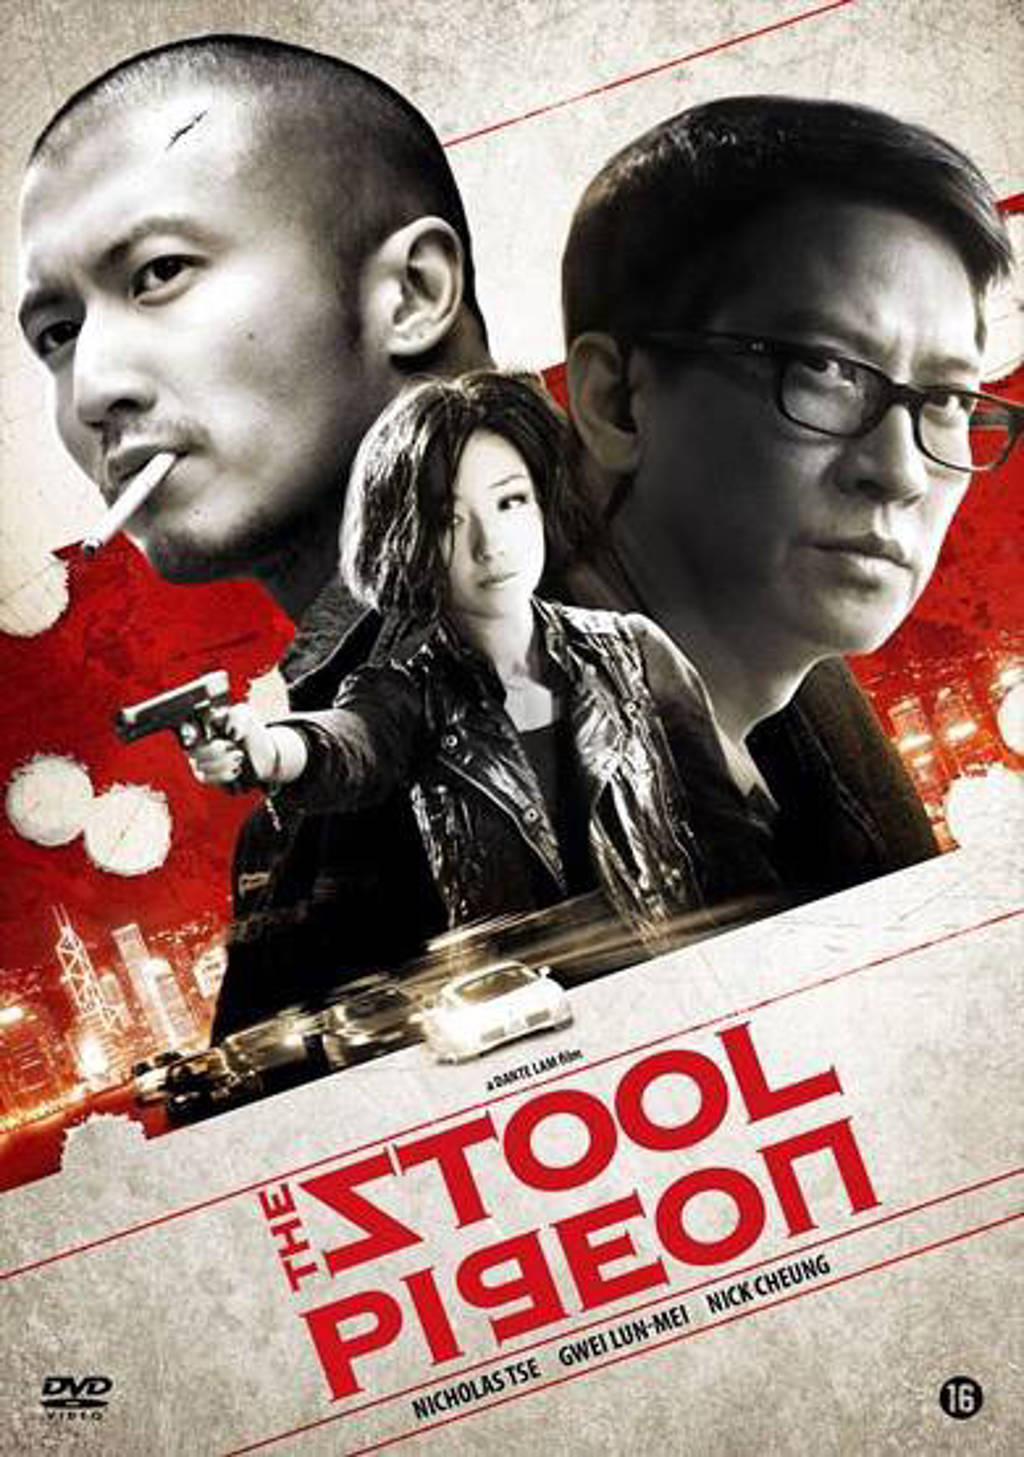 Stool pigeon (DVD)